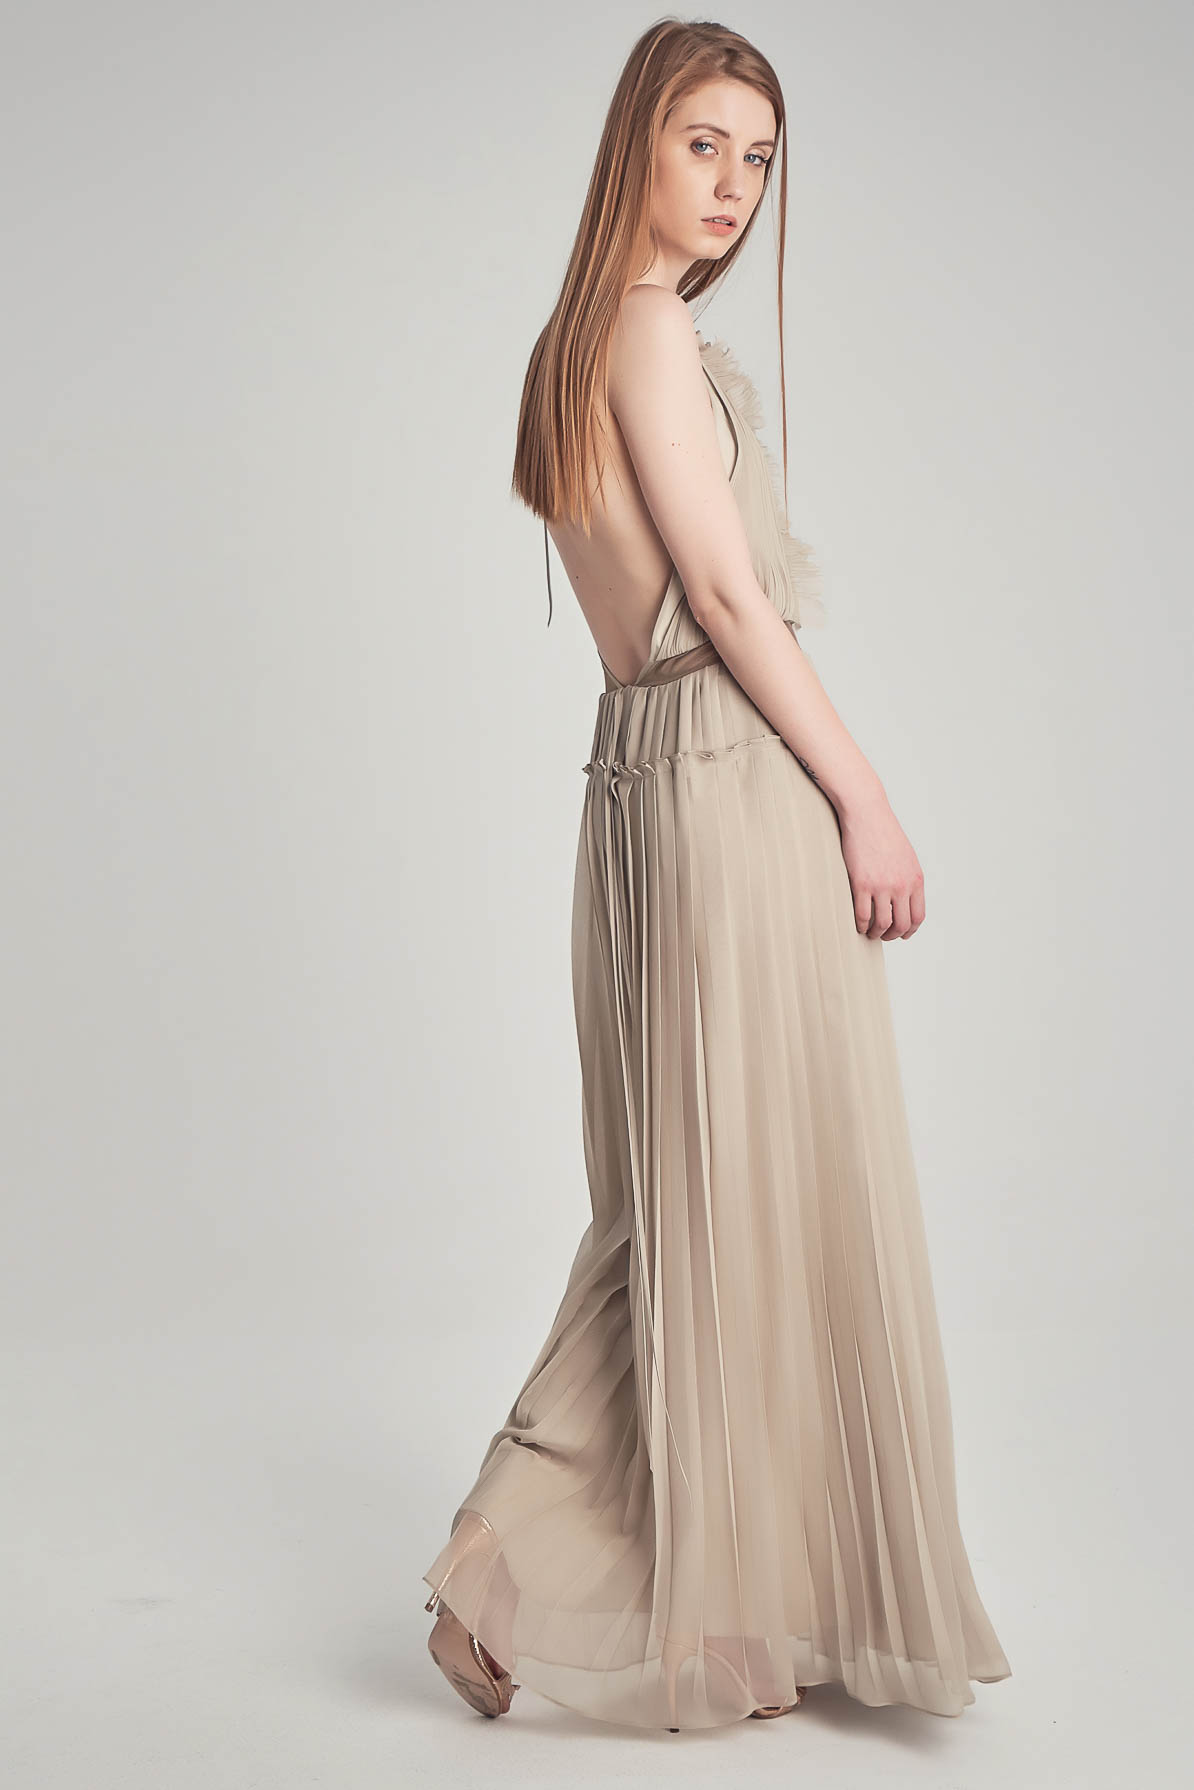 Lulu Gold Dress